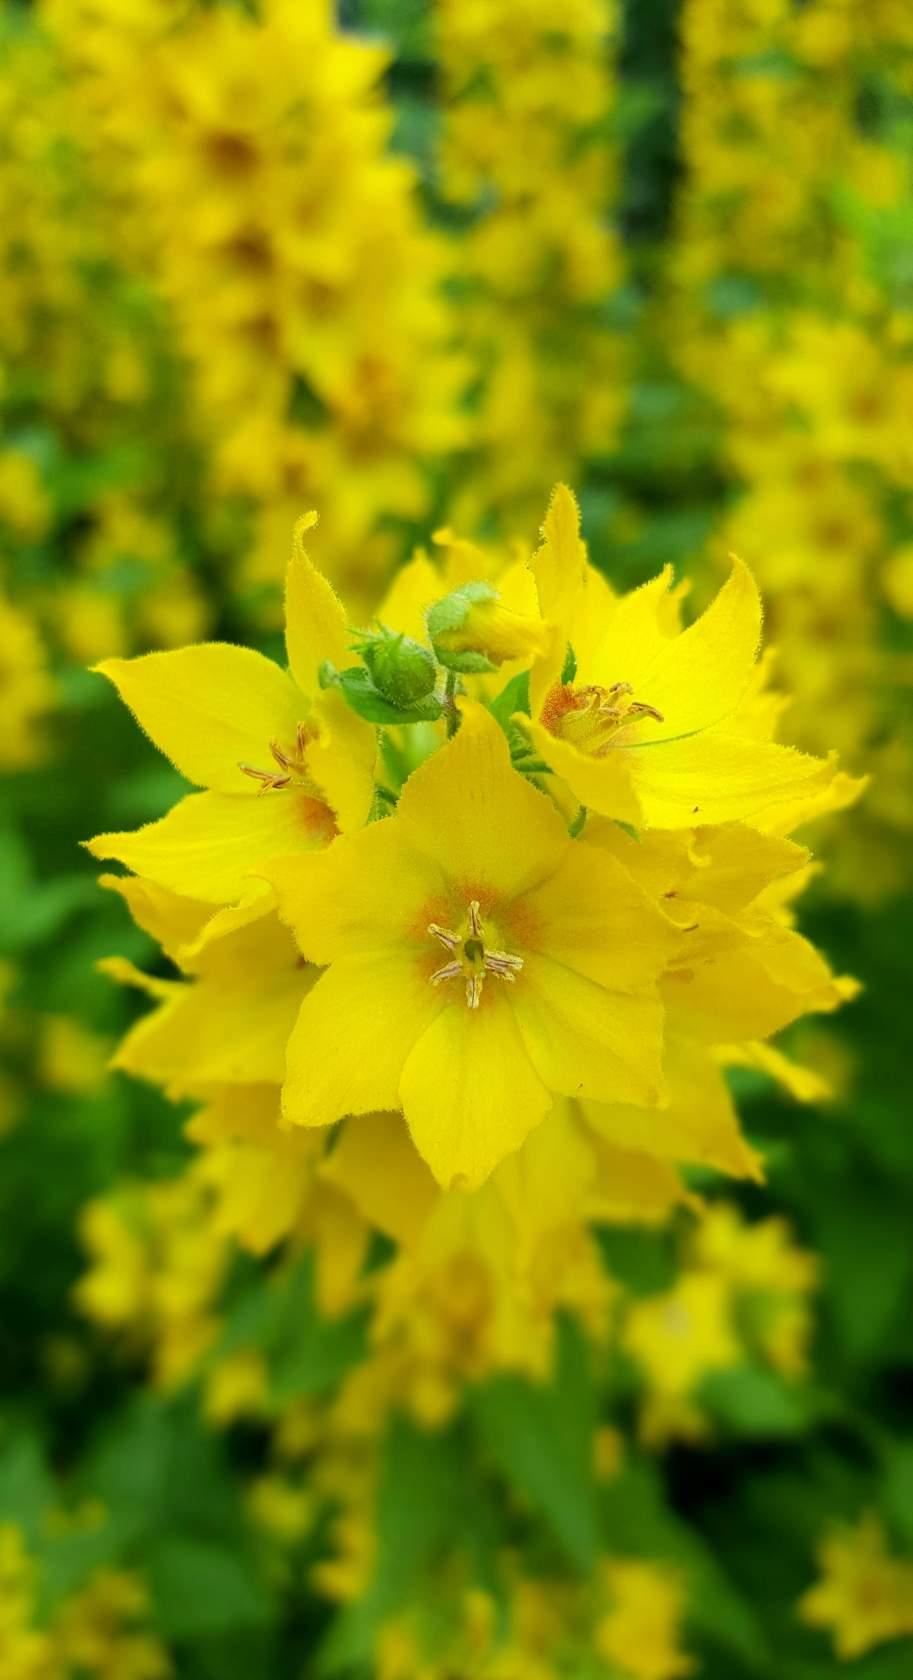 Собачки. Блиц: желтые цветы